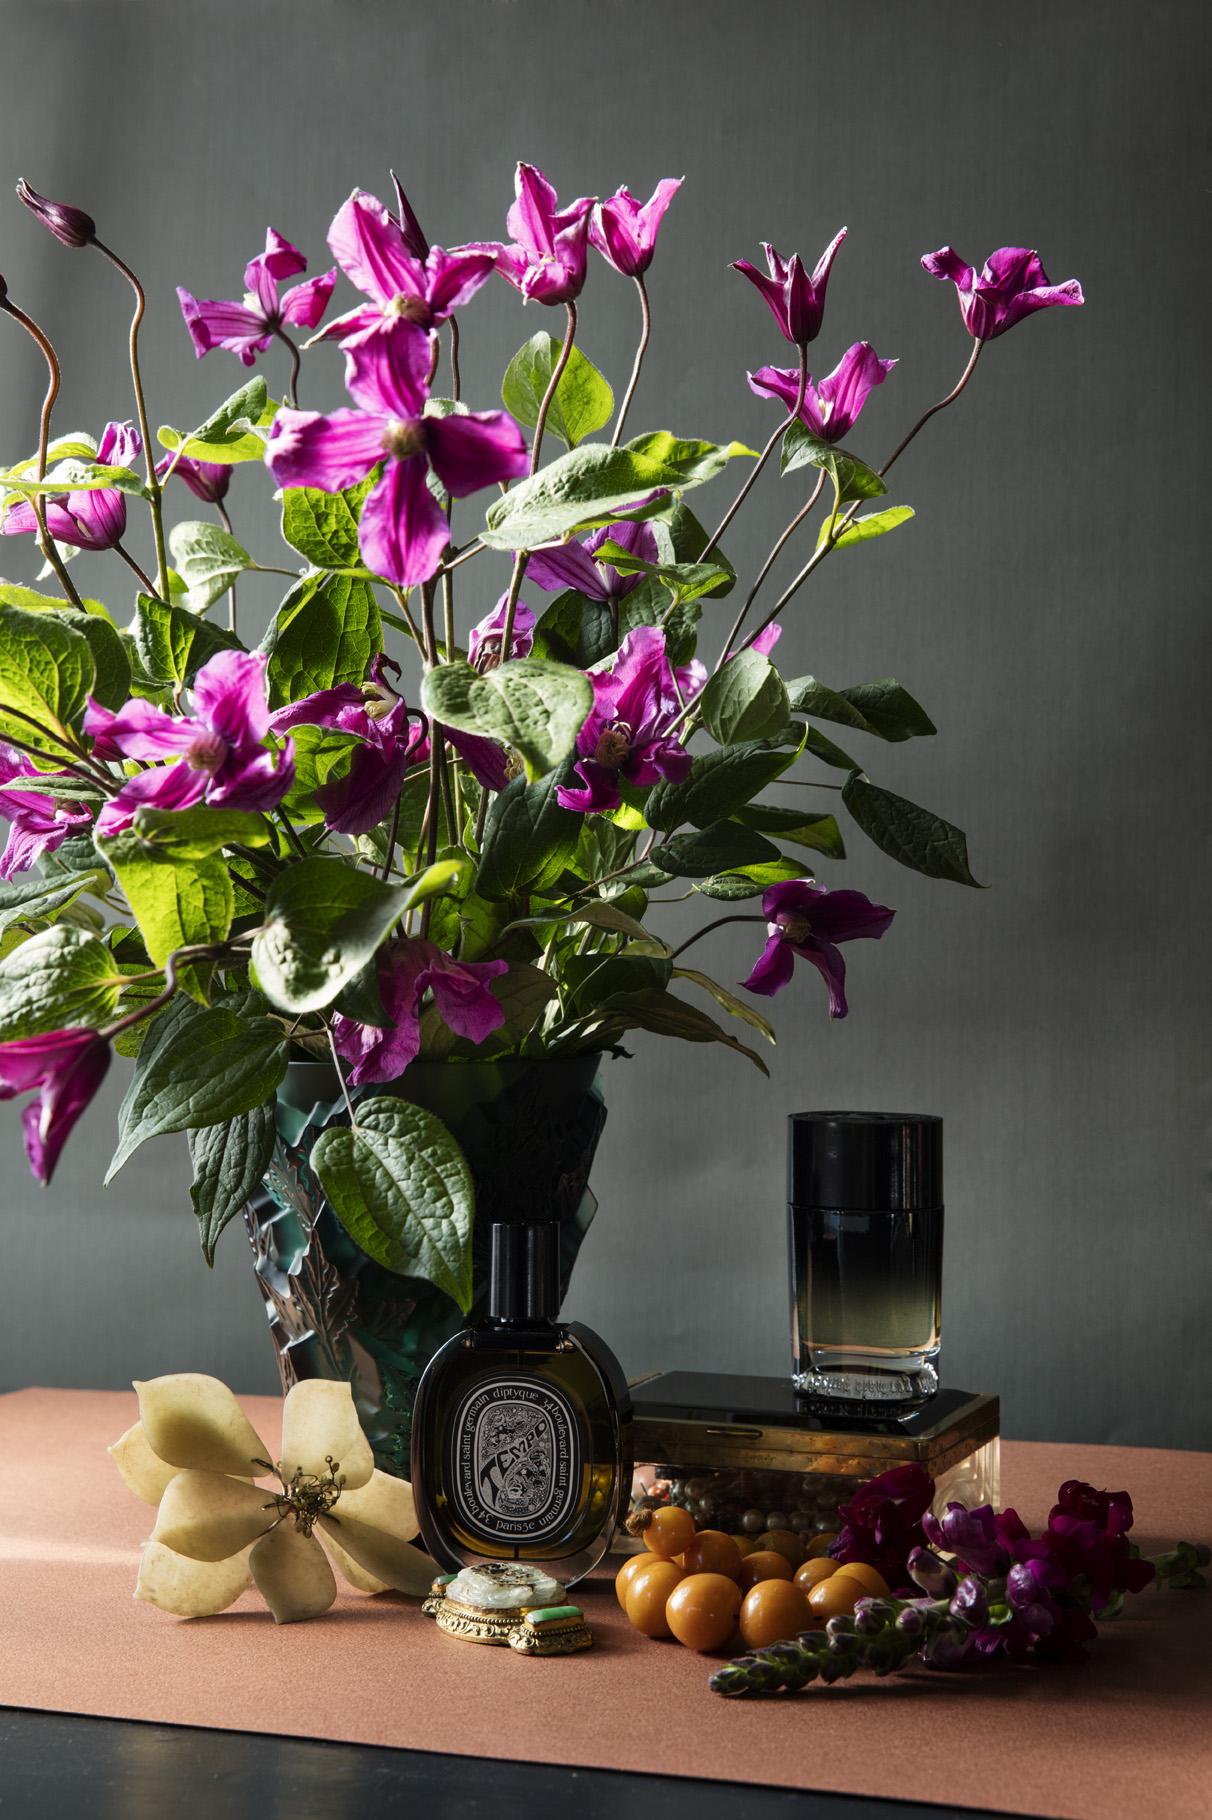 Vase fra Lalique / Interiørgalleriet.  Parfyme fra Diptyque / Heaven Scent.